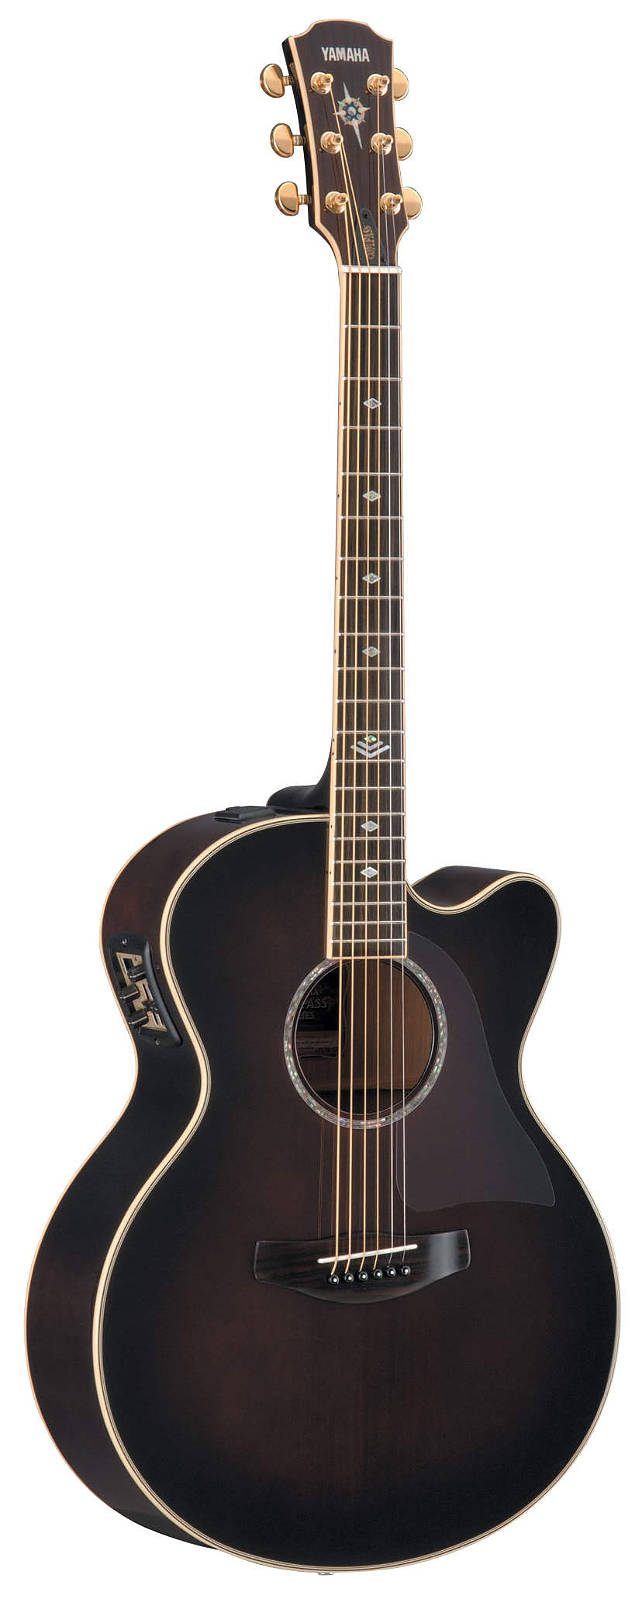 yamaha cpx 900 mbl elektro akustik gitarre. Black Bedroom Furniture Sets. Home Design Ideas